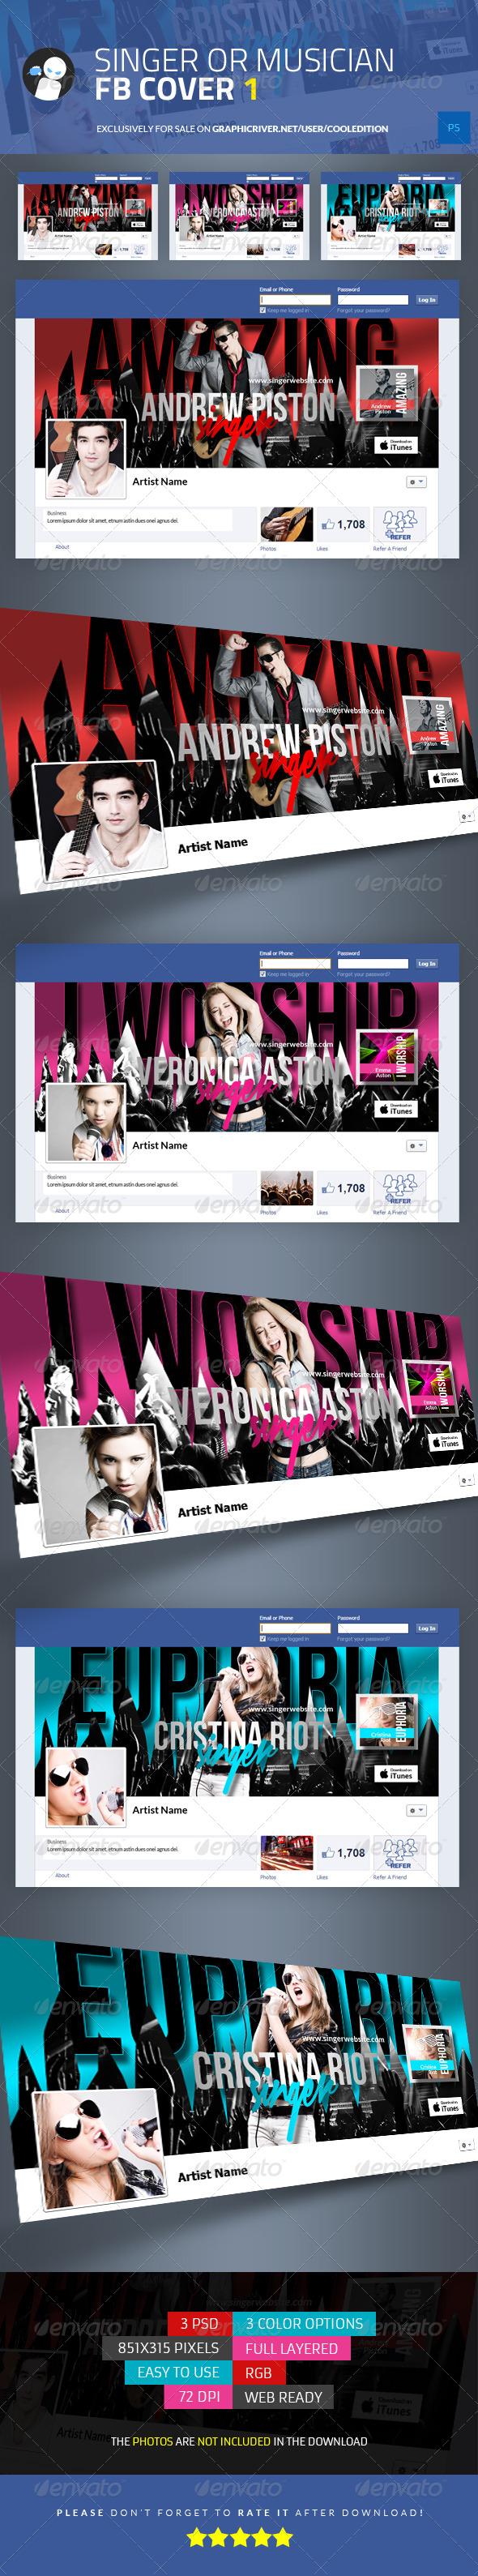 Singer or Musician Facebook Cover 1 - Facebook Timeline Covers Social Media